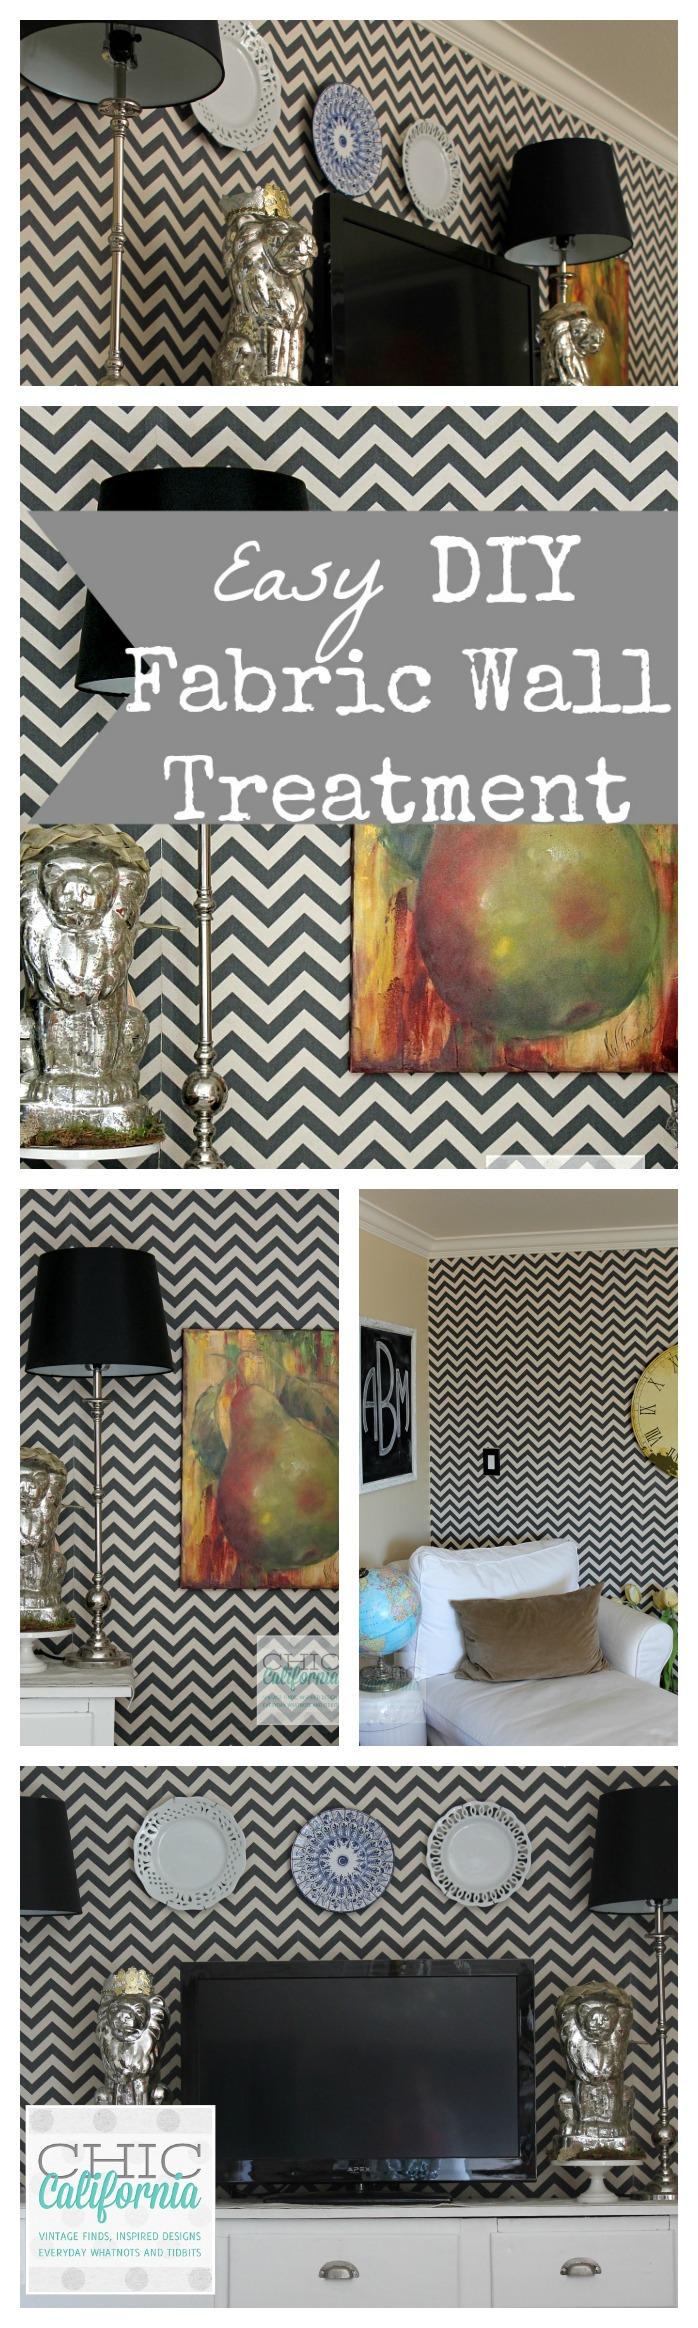 Easy DIY Fabric Wall Treament collage